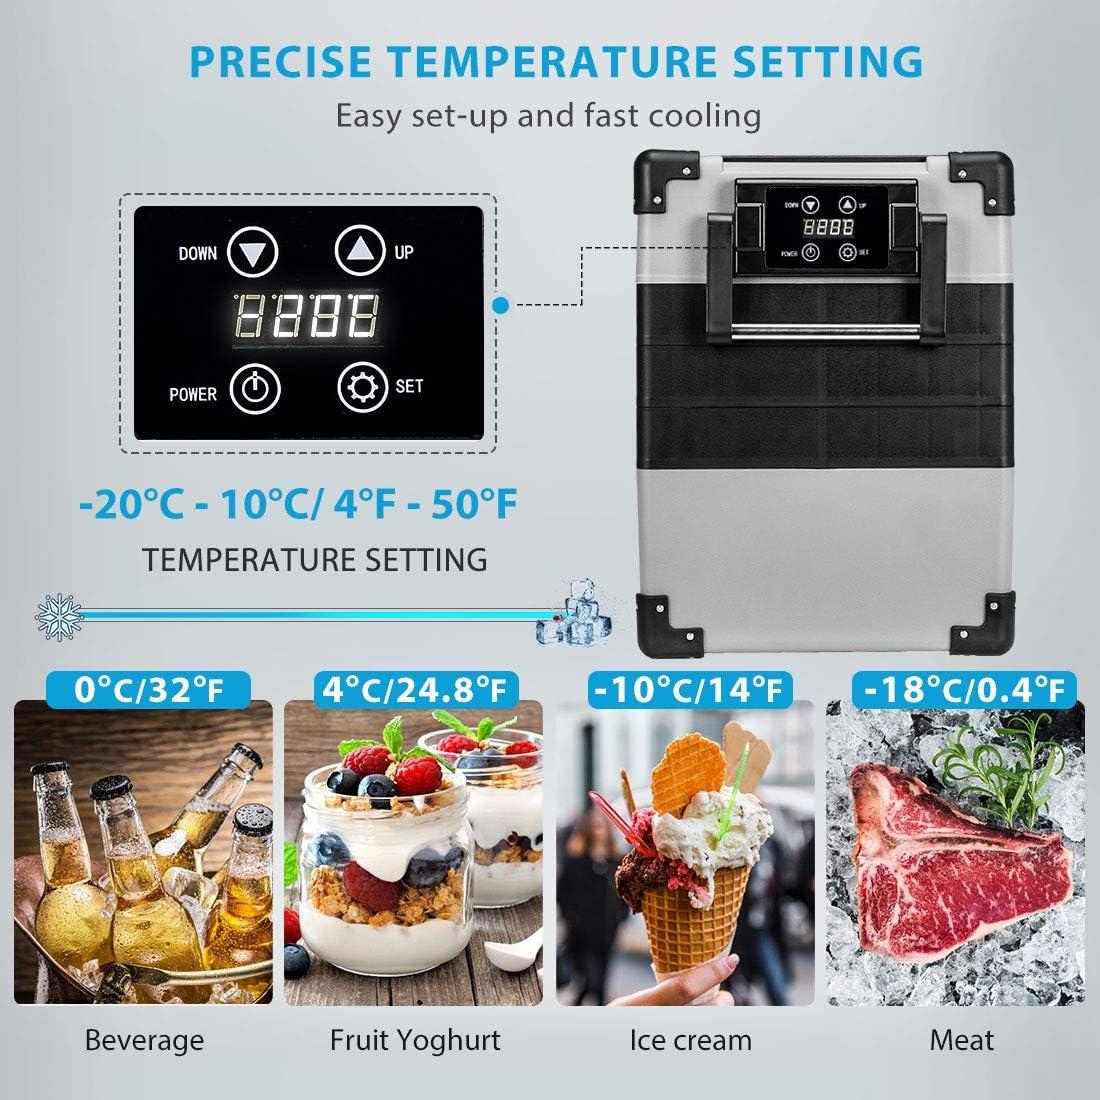 4-50/°F Compact Compressor RV Refrigerator with Basket and Insulated Bag for Home Office Camping Travel VIVOHOME 45 Quart DC 12//24V Portable Electric Freezer Cooler